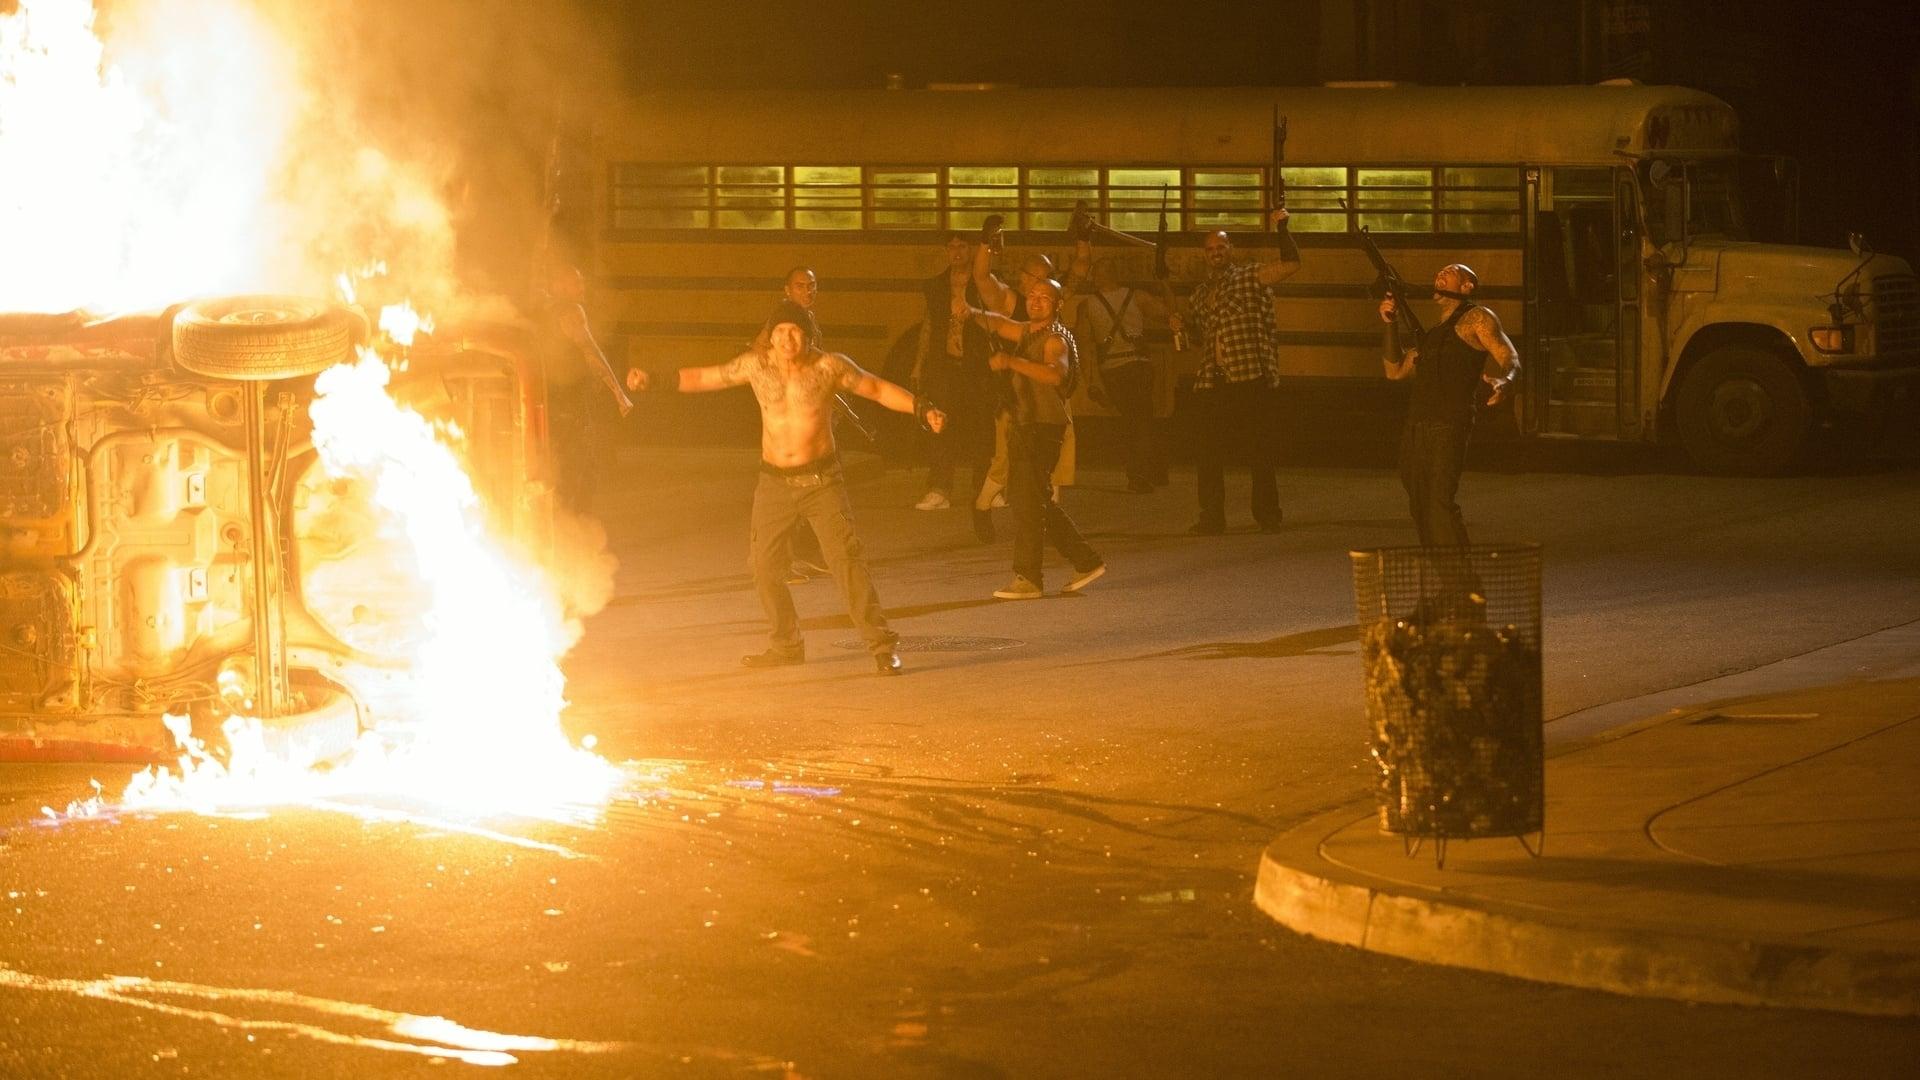 Free Watch The Purge: Anarchy 2014 Online Movie